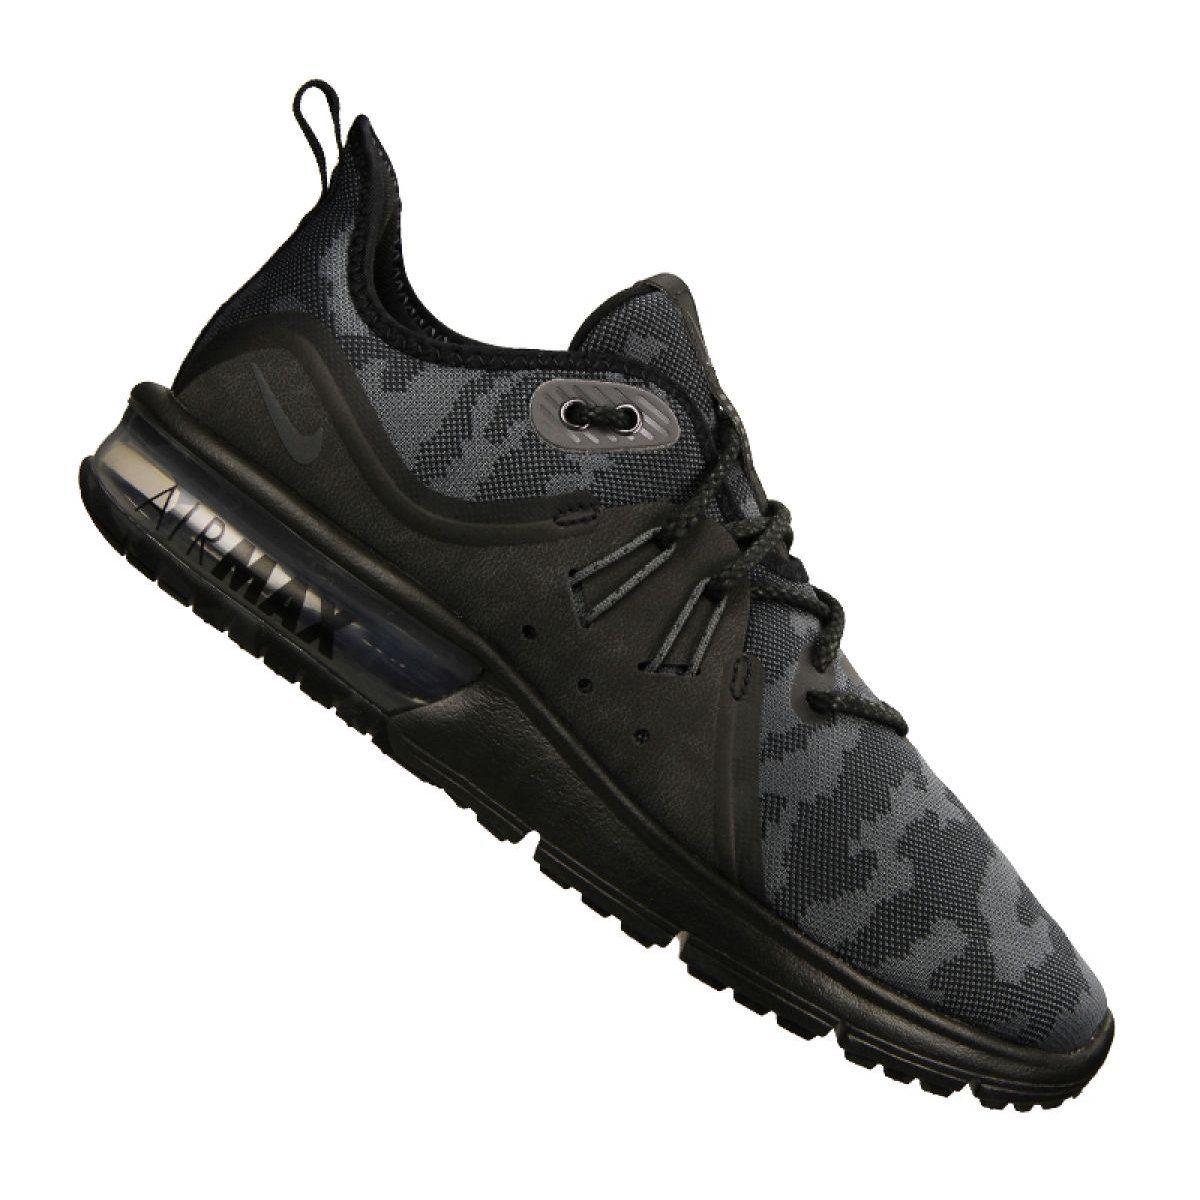 Training Running Sport Nike Nike Air Max Sequent 3 Prm Cmo M Ar0251 002 Shoes Nike Air Max Running Shoes For Men Nike Air